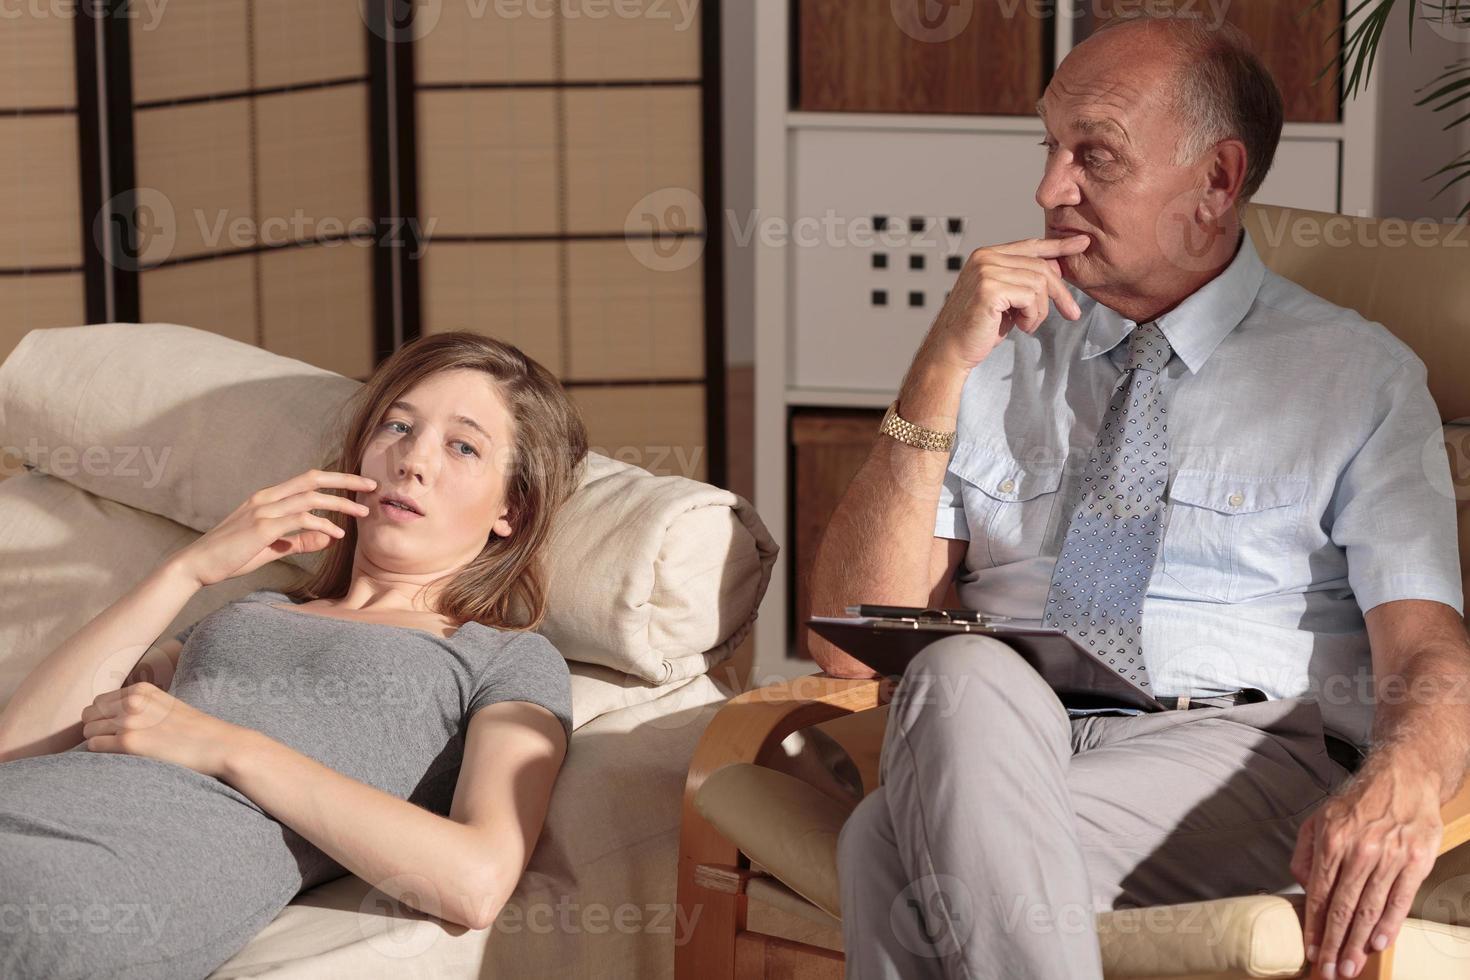 rijke zakenvrouw en privétherapeut foto